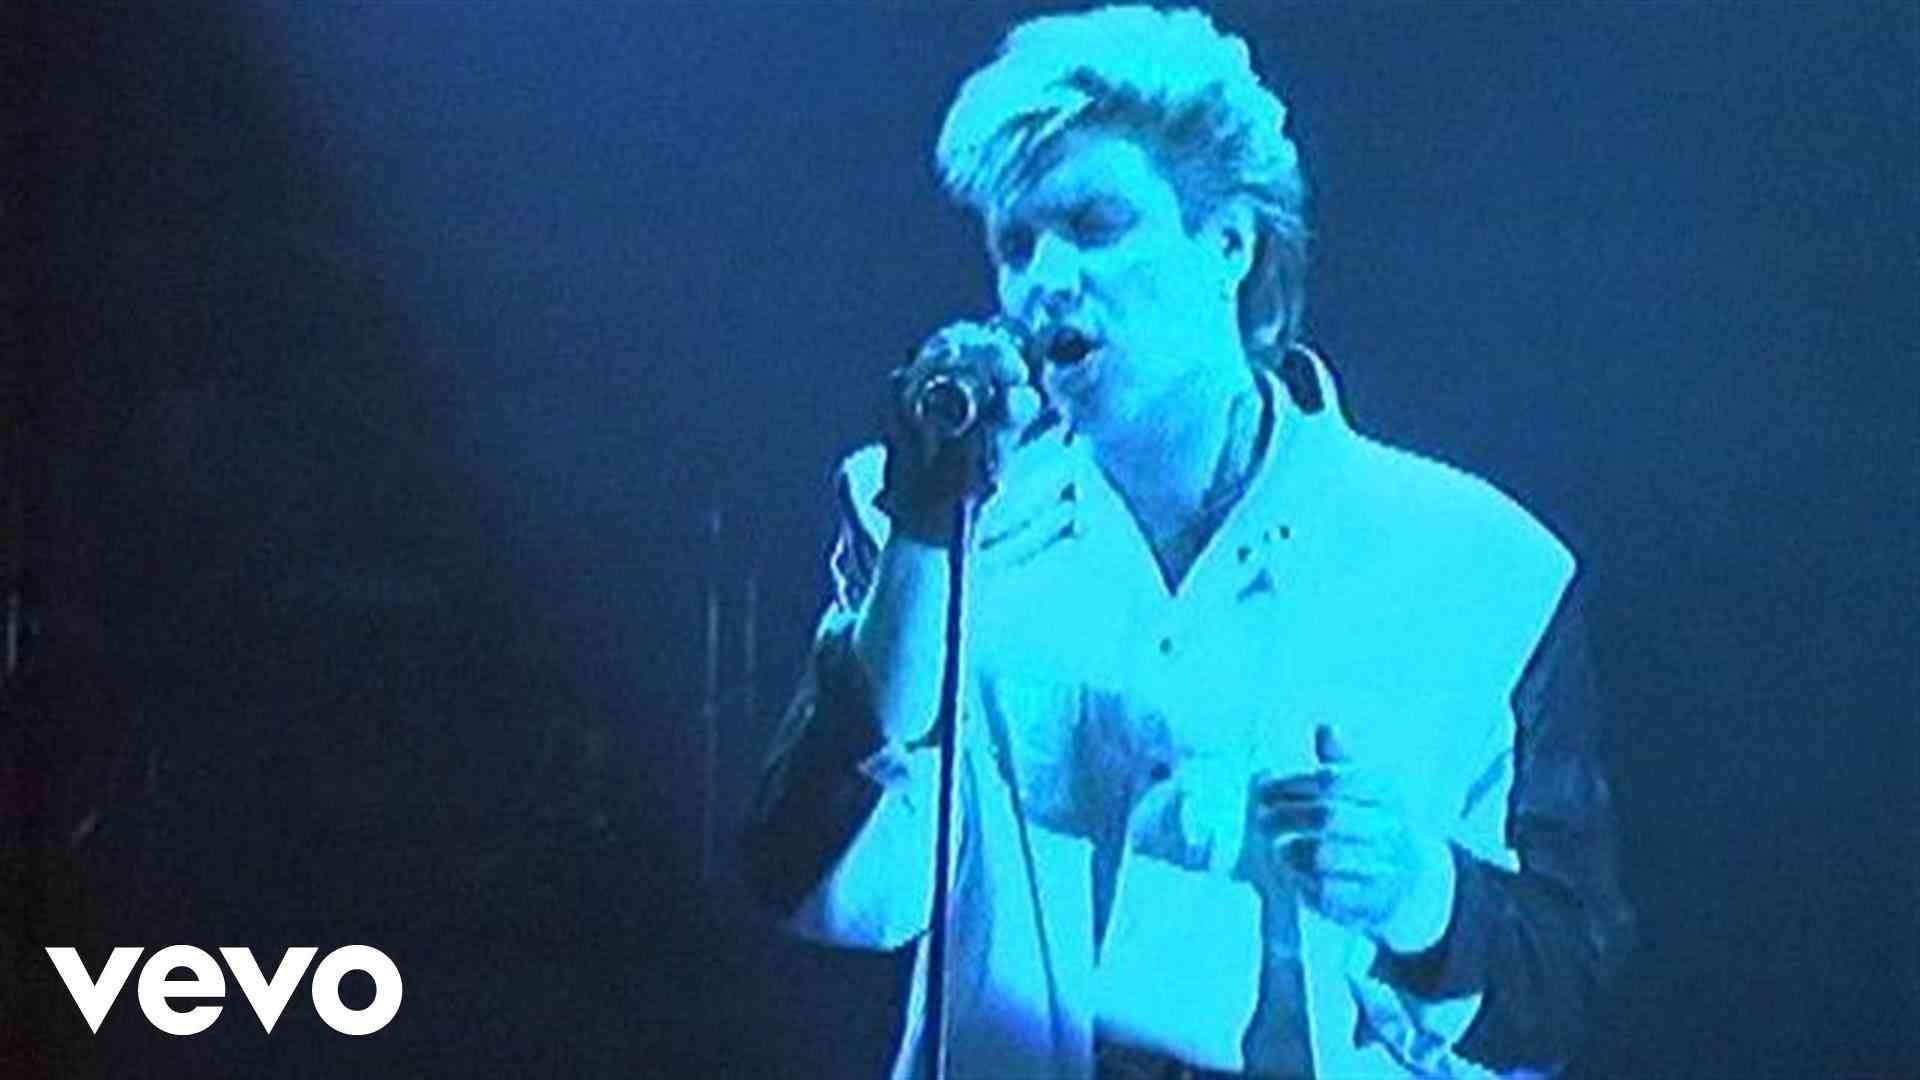 Duran Duran - The Reflex - YouTube